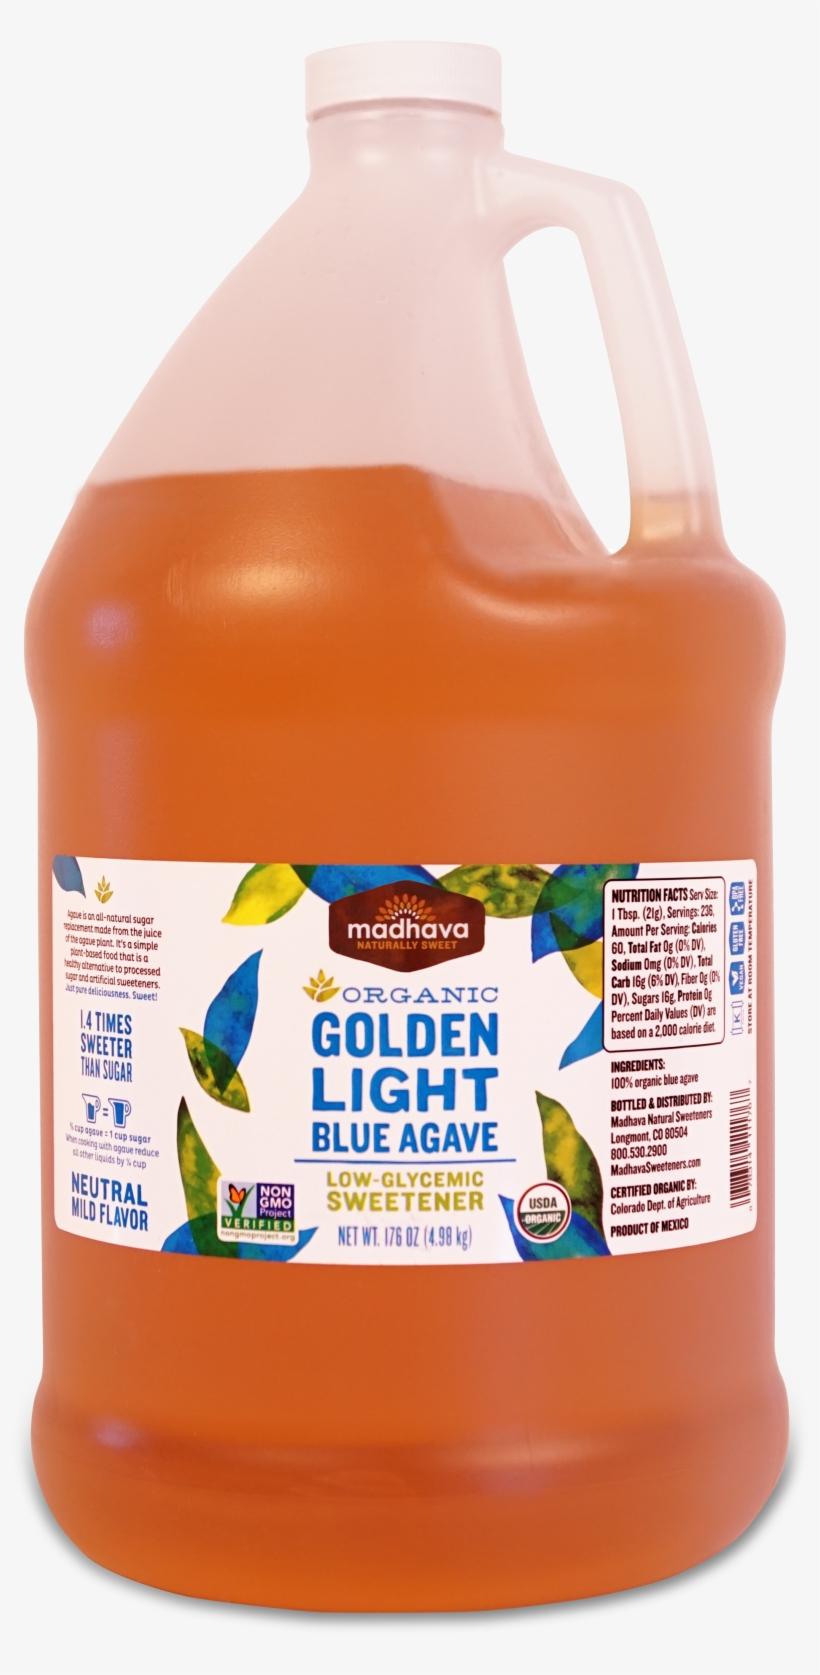 Organic Golden Light Agave 176 Oz - Madhava - Organic Golden Light Blue Agave - 46 Oz., transparent png #678629